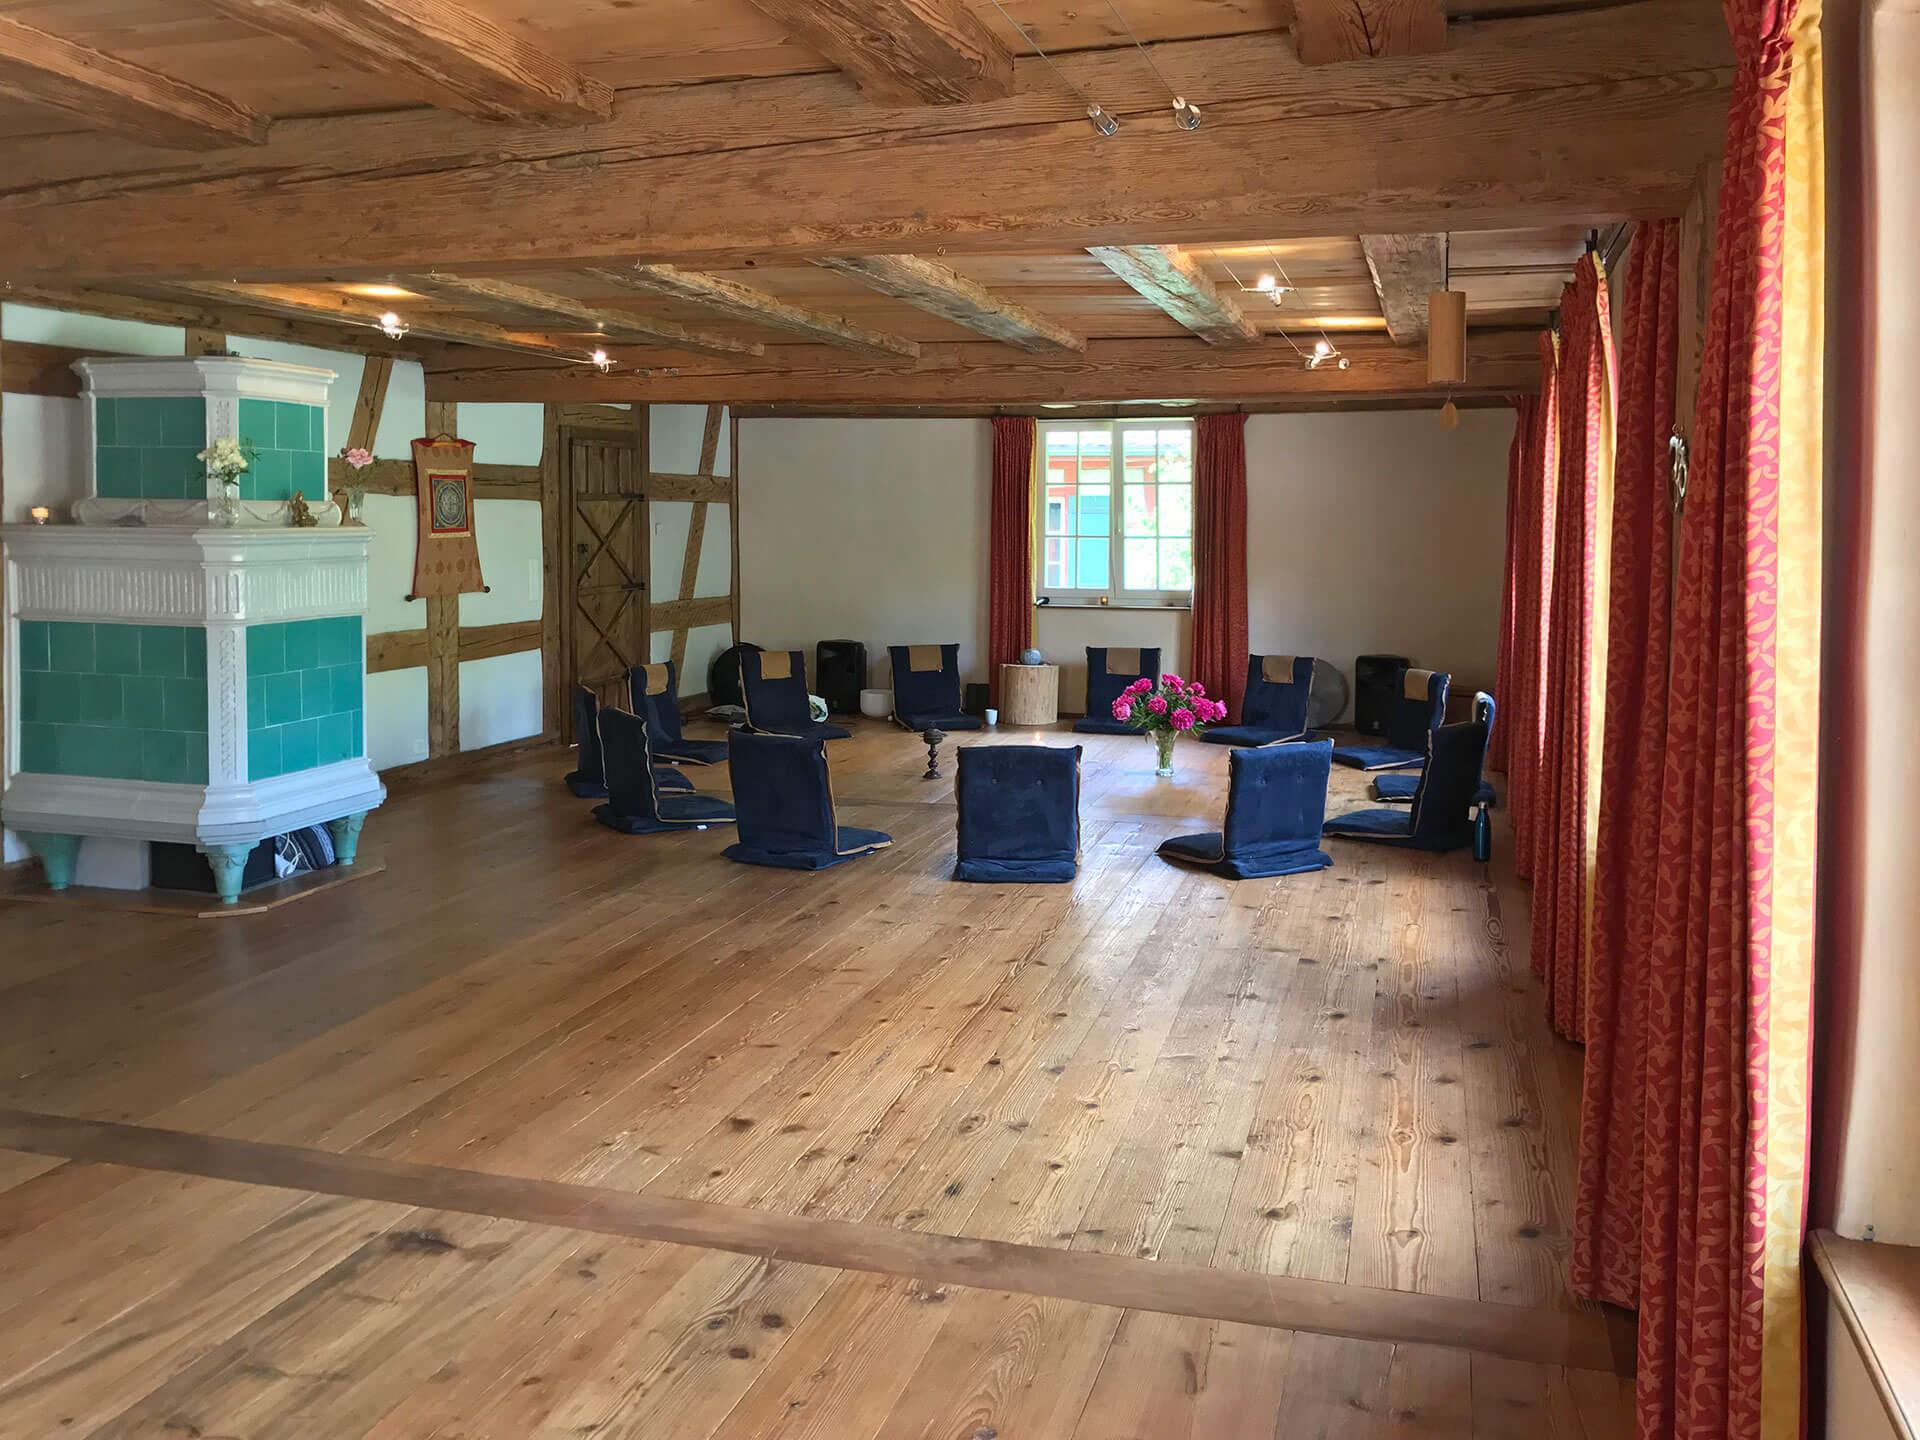 Klingenmuehle Potenzial entfalten Wochenendseminar Seminarraum